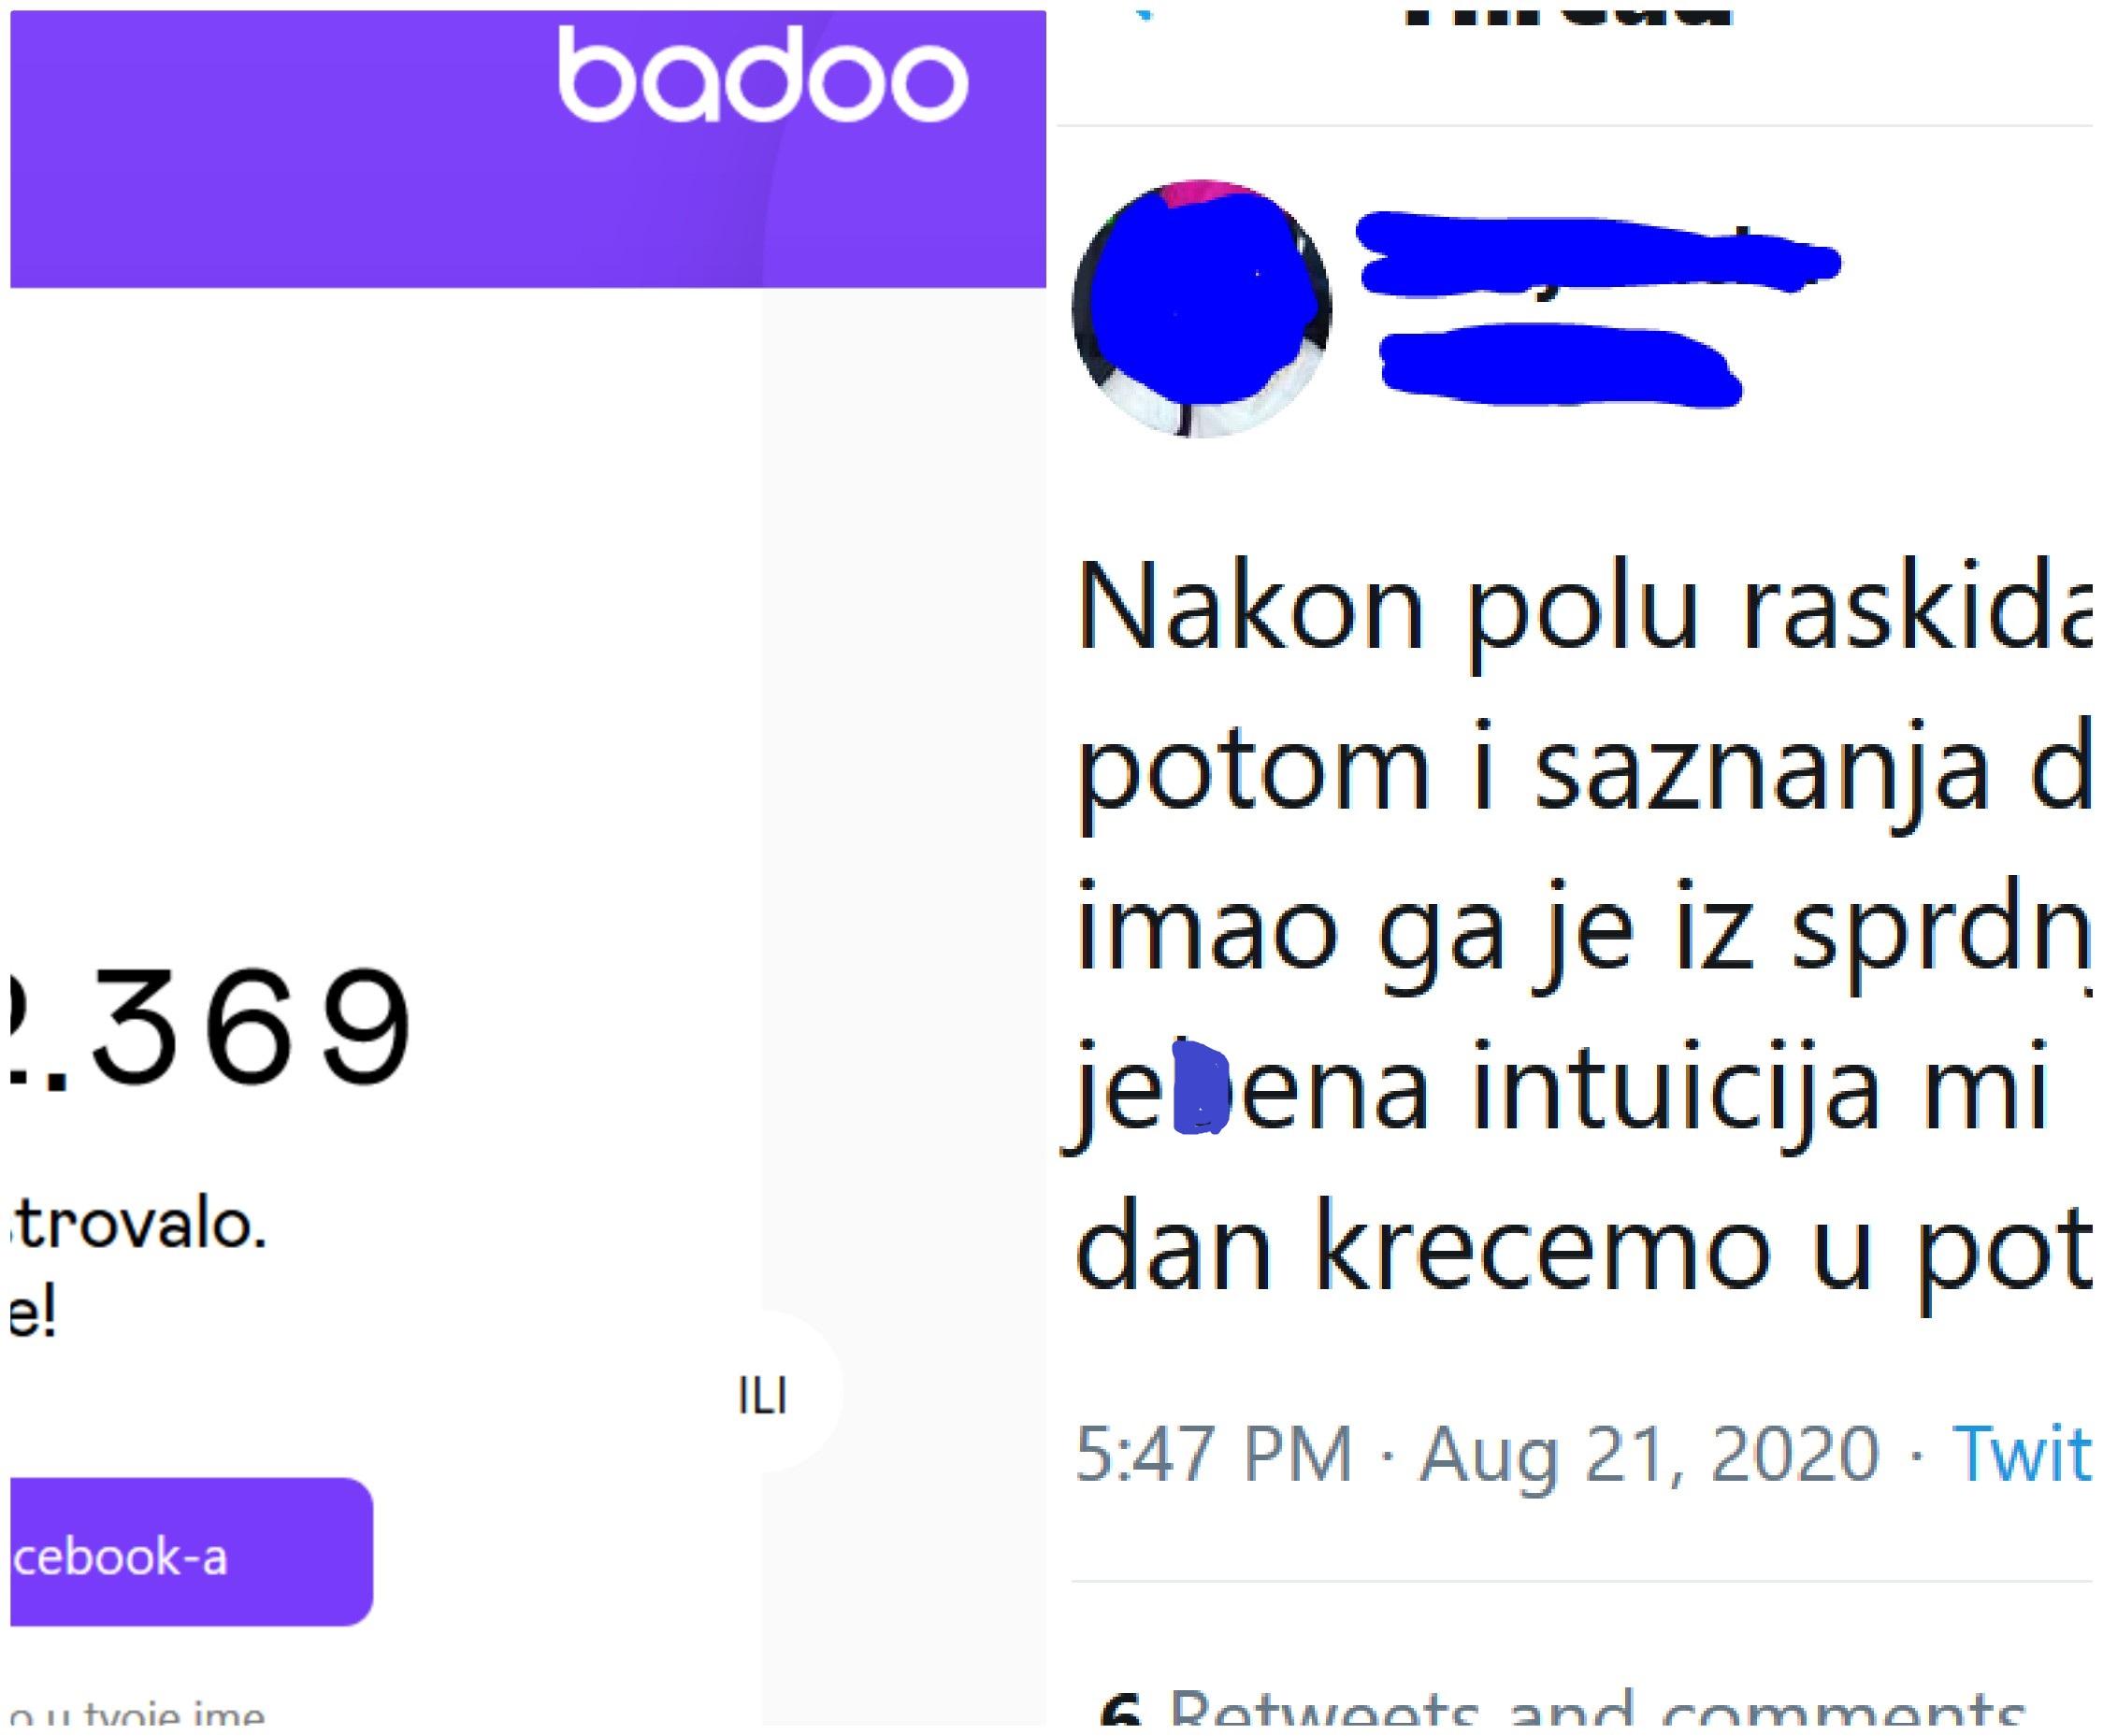 Badoo profil je izbrisan tvoj Kako odjaviti